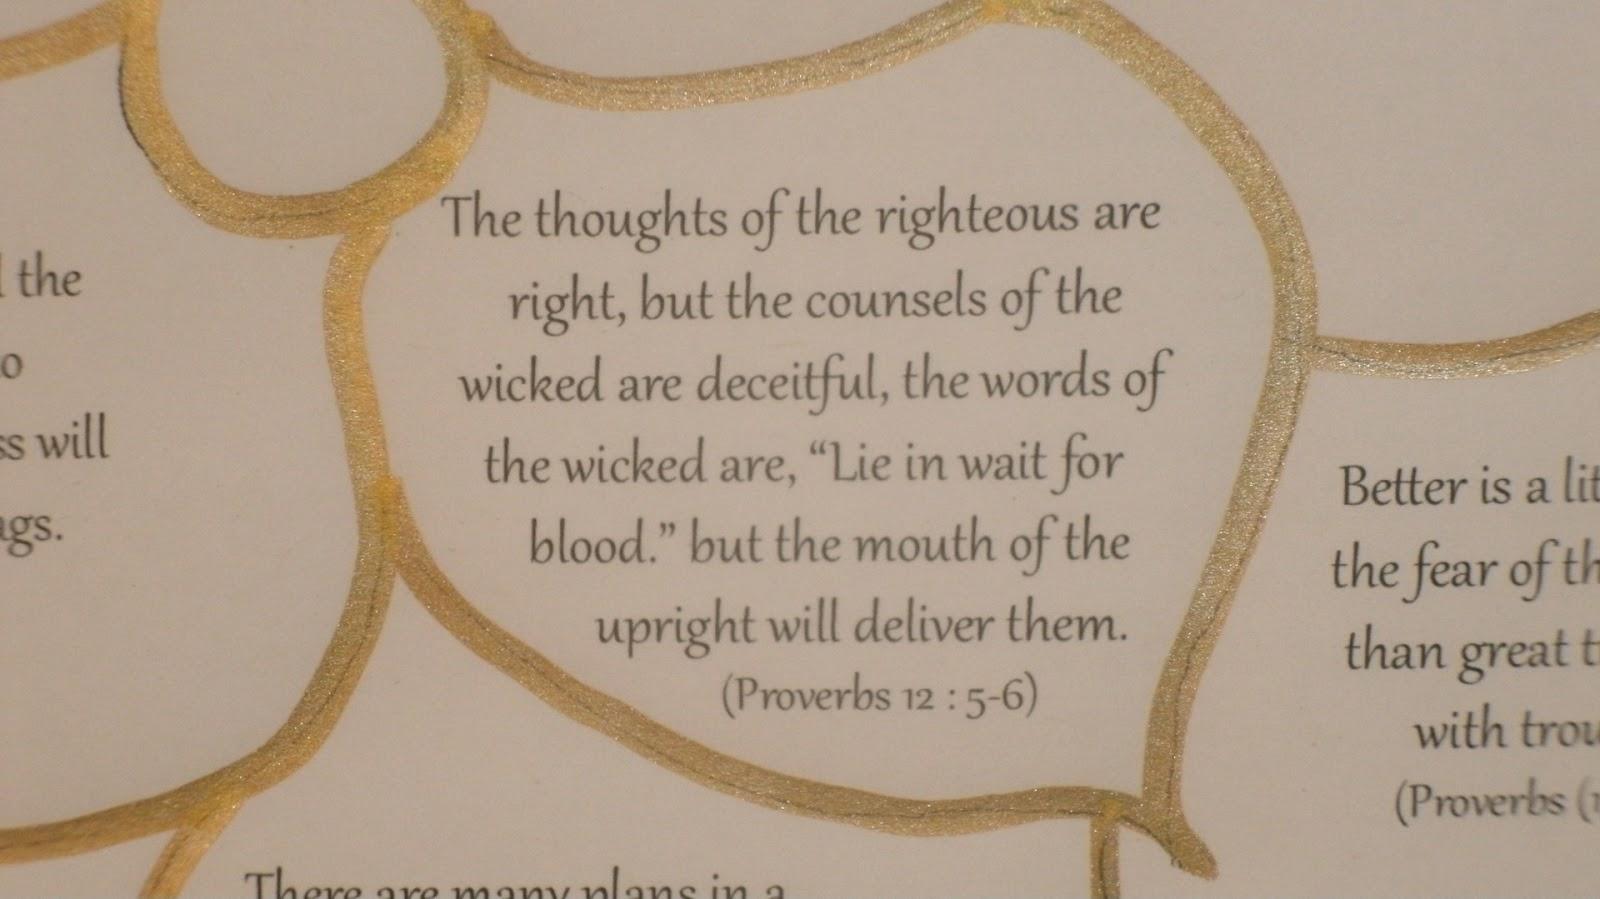 Flower Verses   Christian Wall Art With Bible Verses